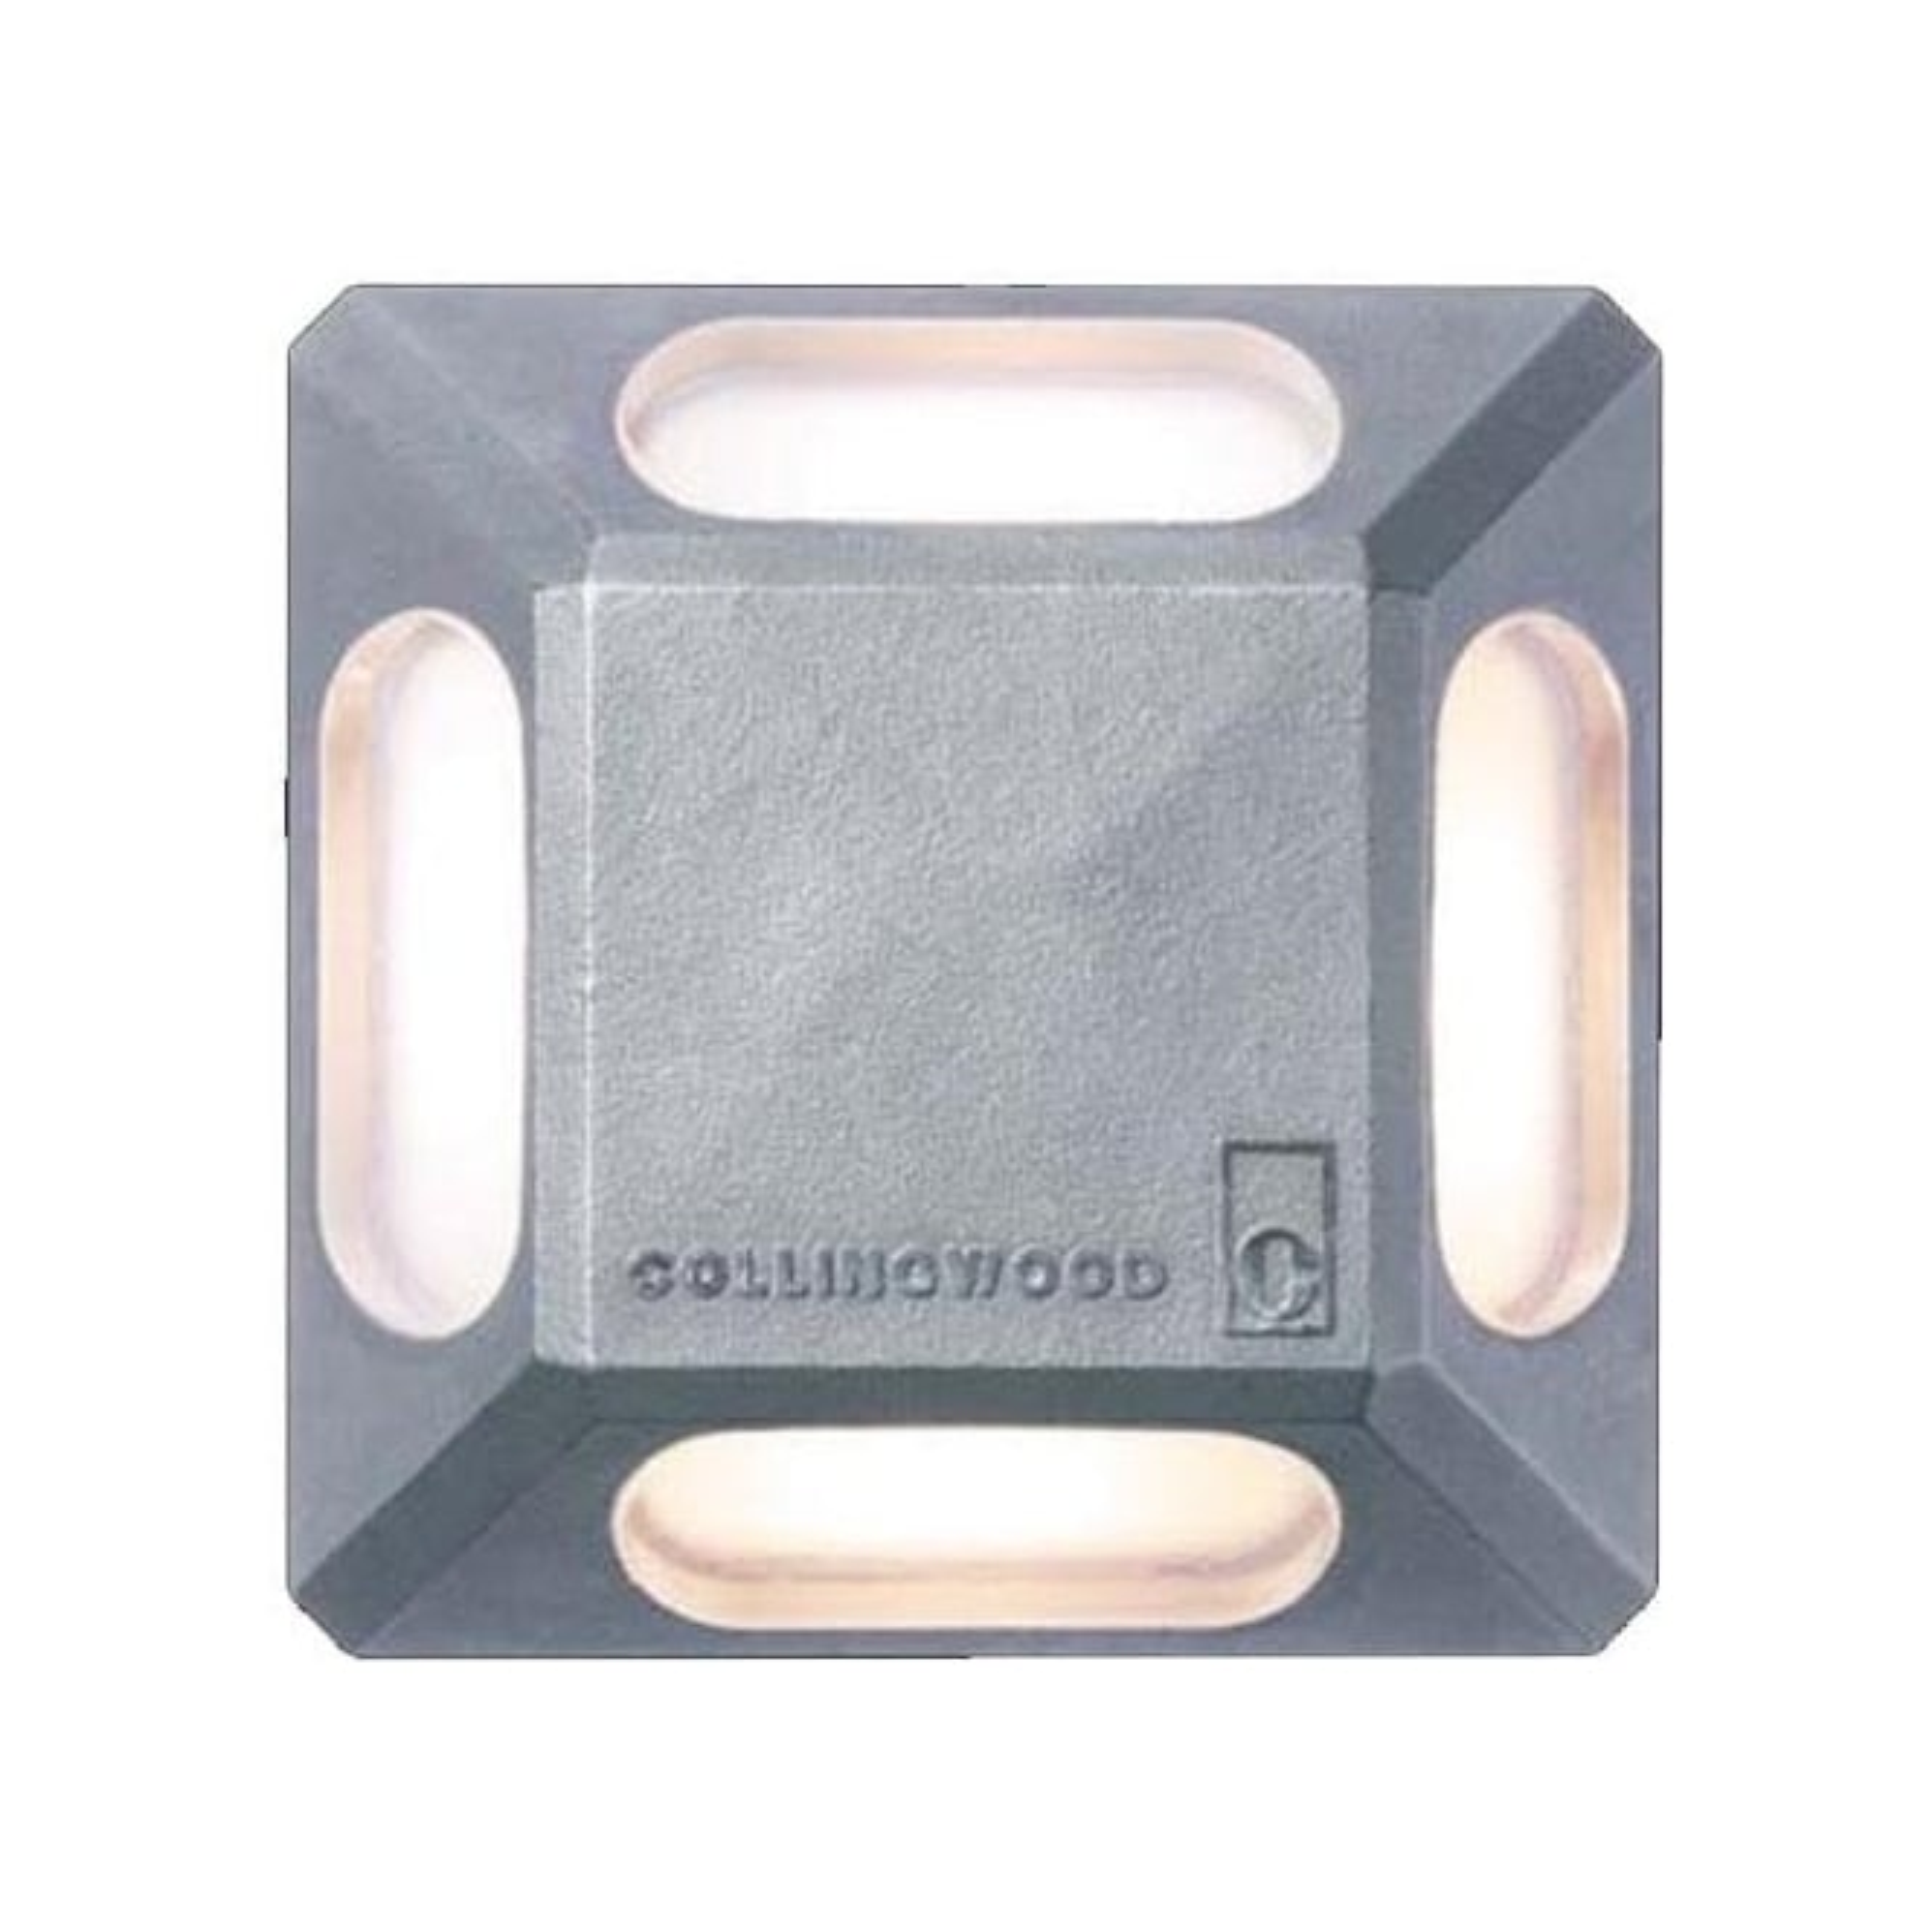 Collingwood Lighting GL064 4 Way LED marker light - stainless steel - Low voltage